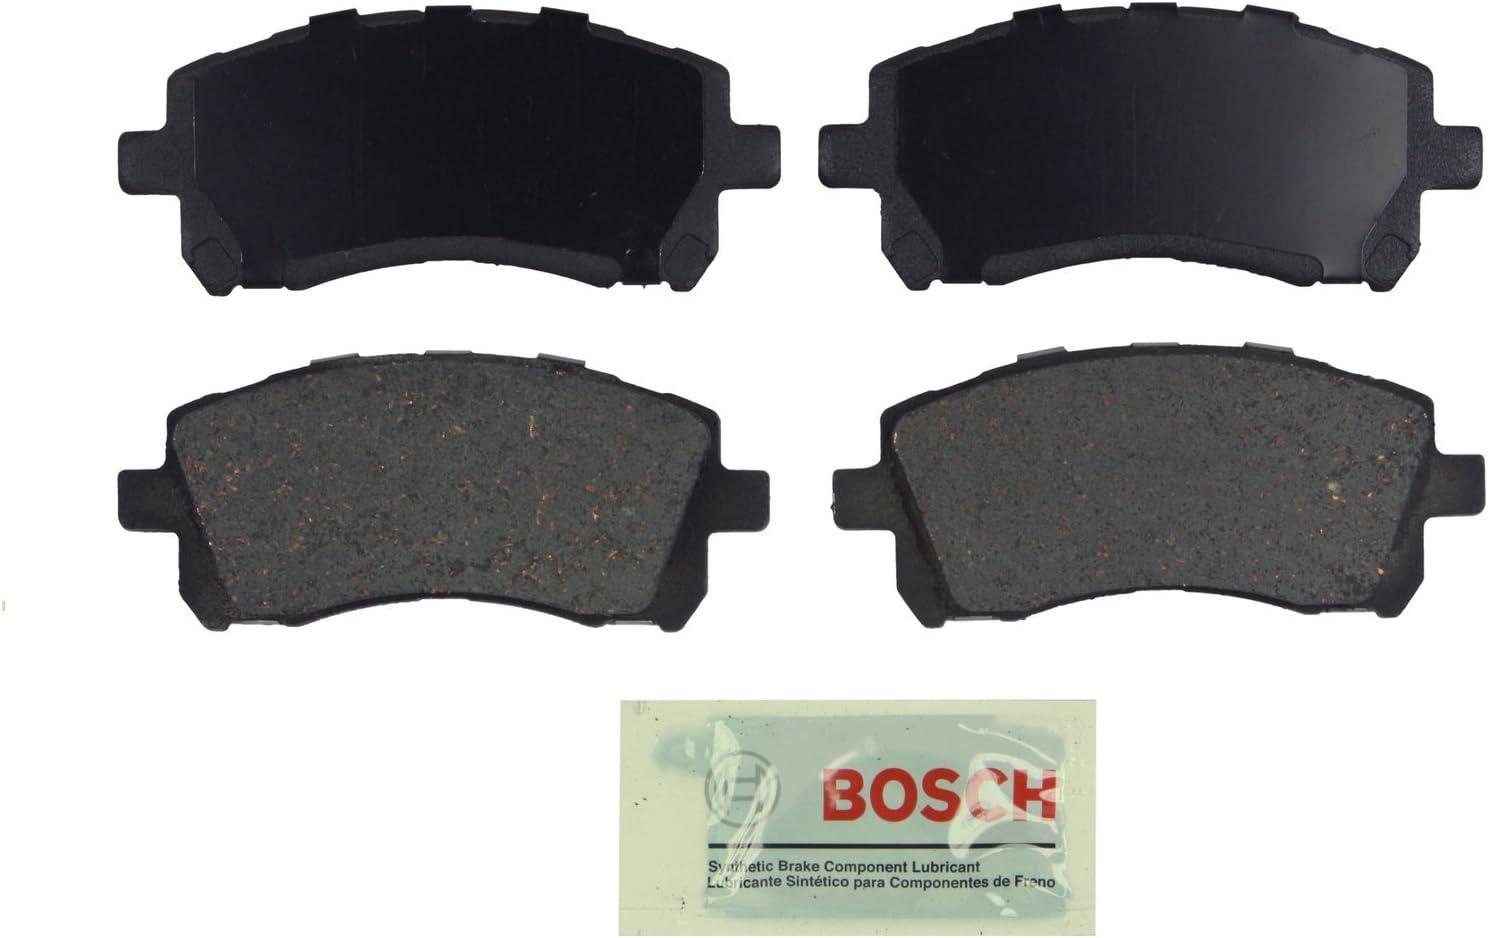 For 1997-2001 Subaru Impreza Legacy Hart Brakes Front Ceramic Brake Pads